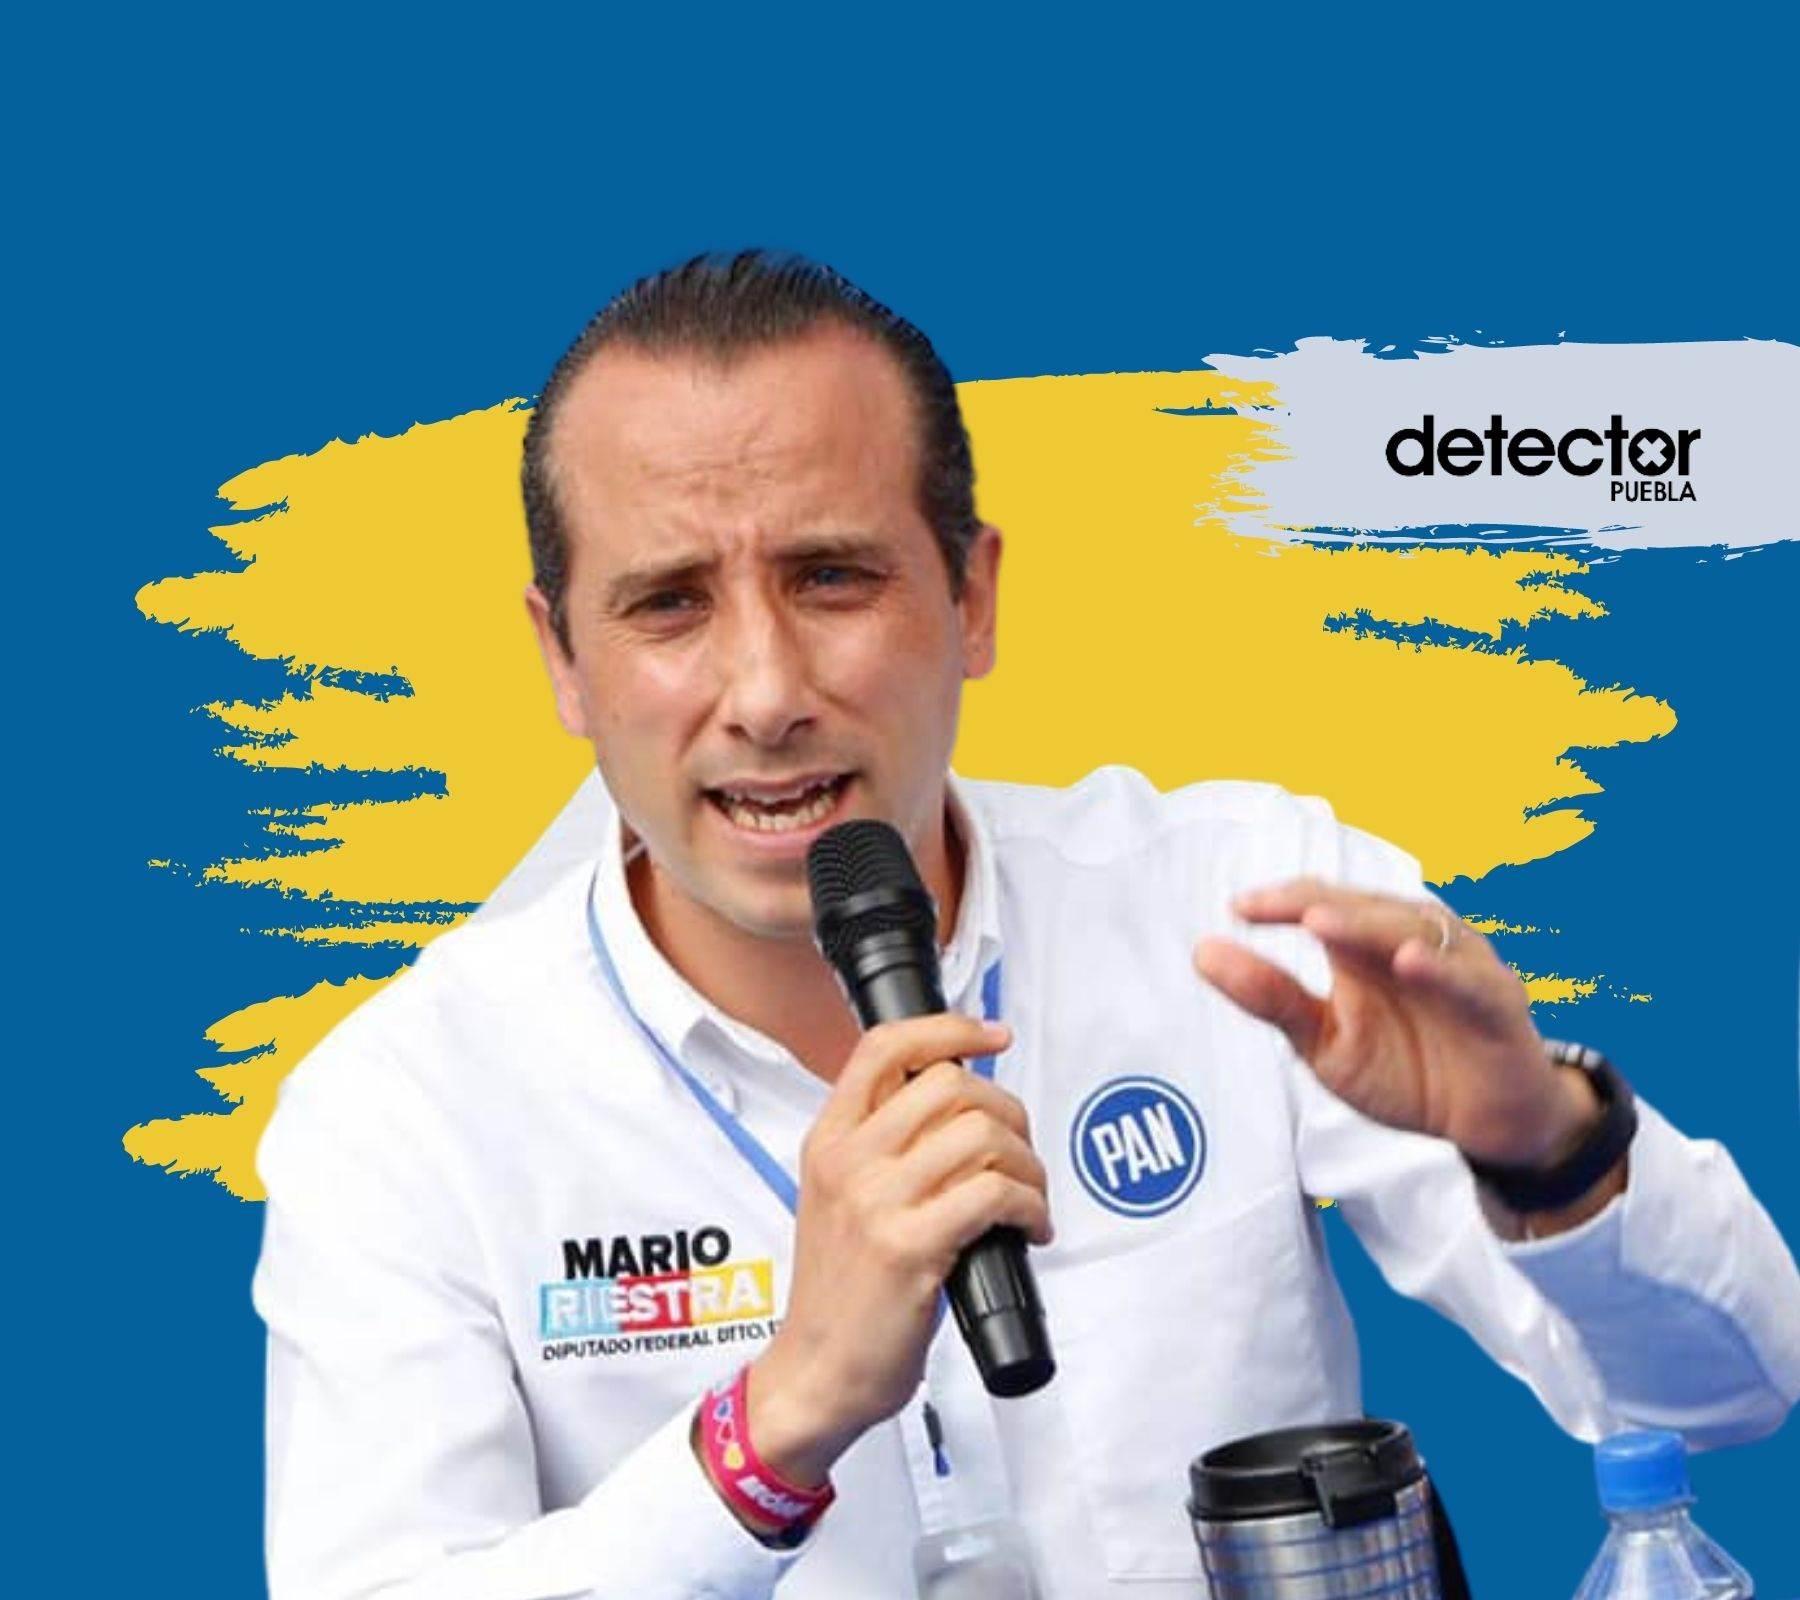 Mario Riestra